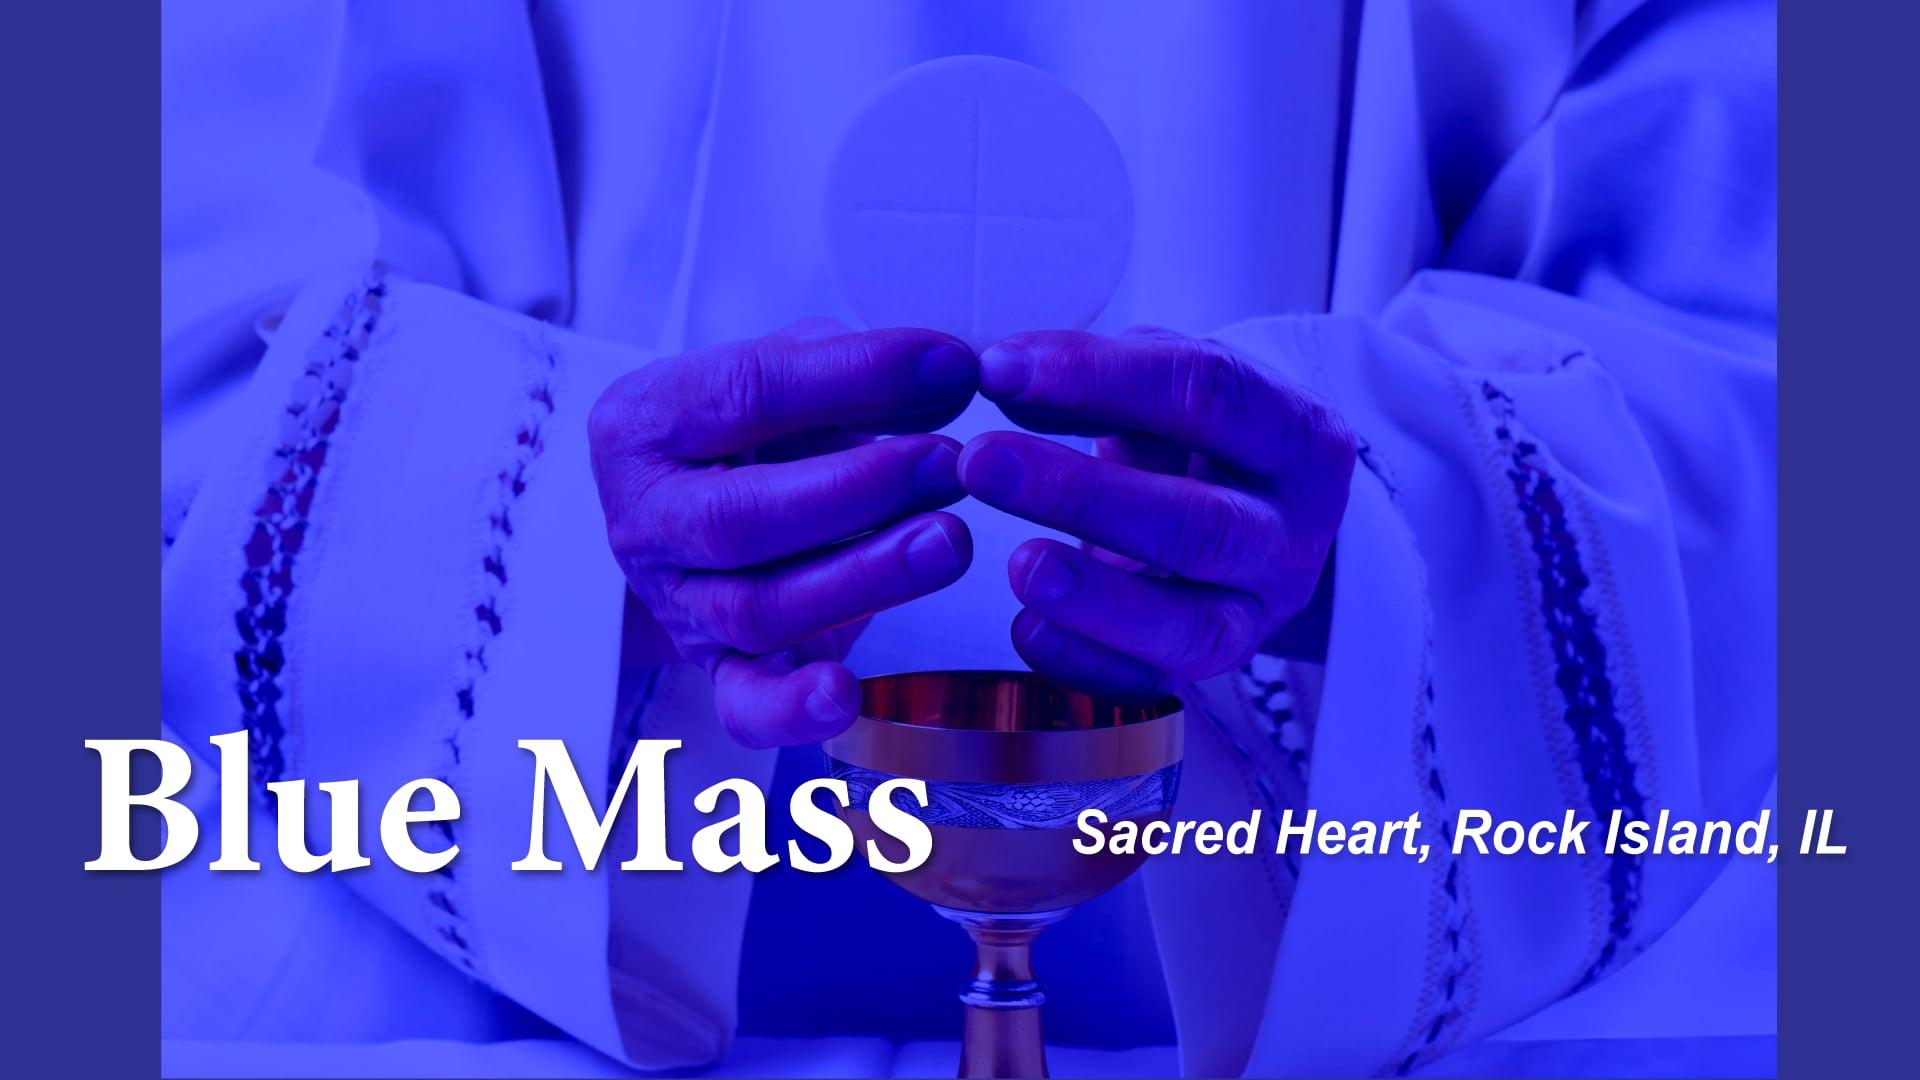 Blue Mass Sacred Heart, Rock Island